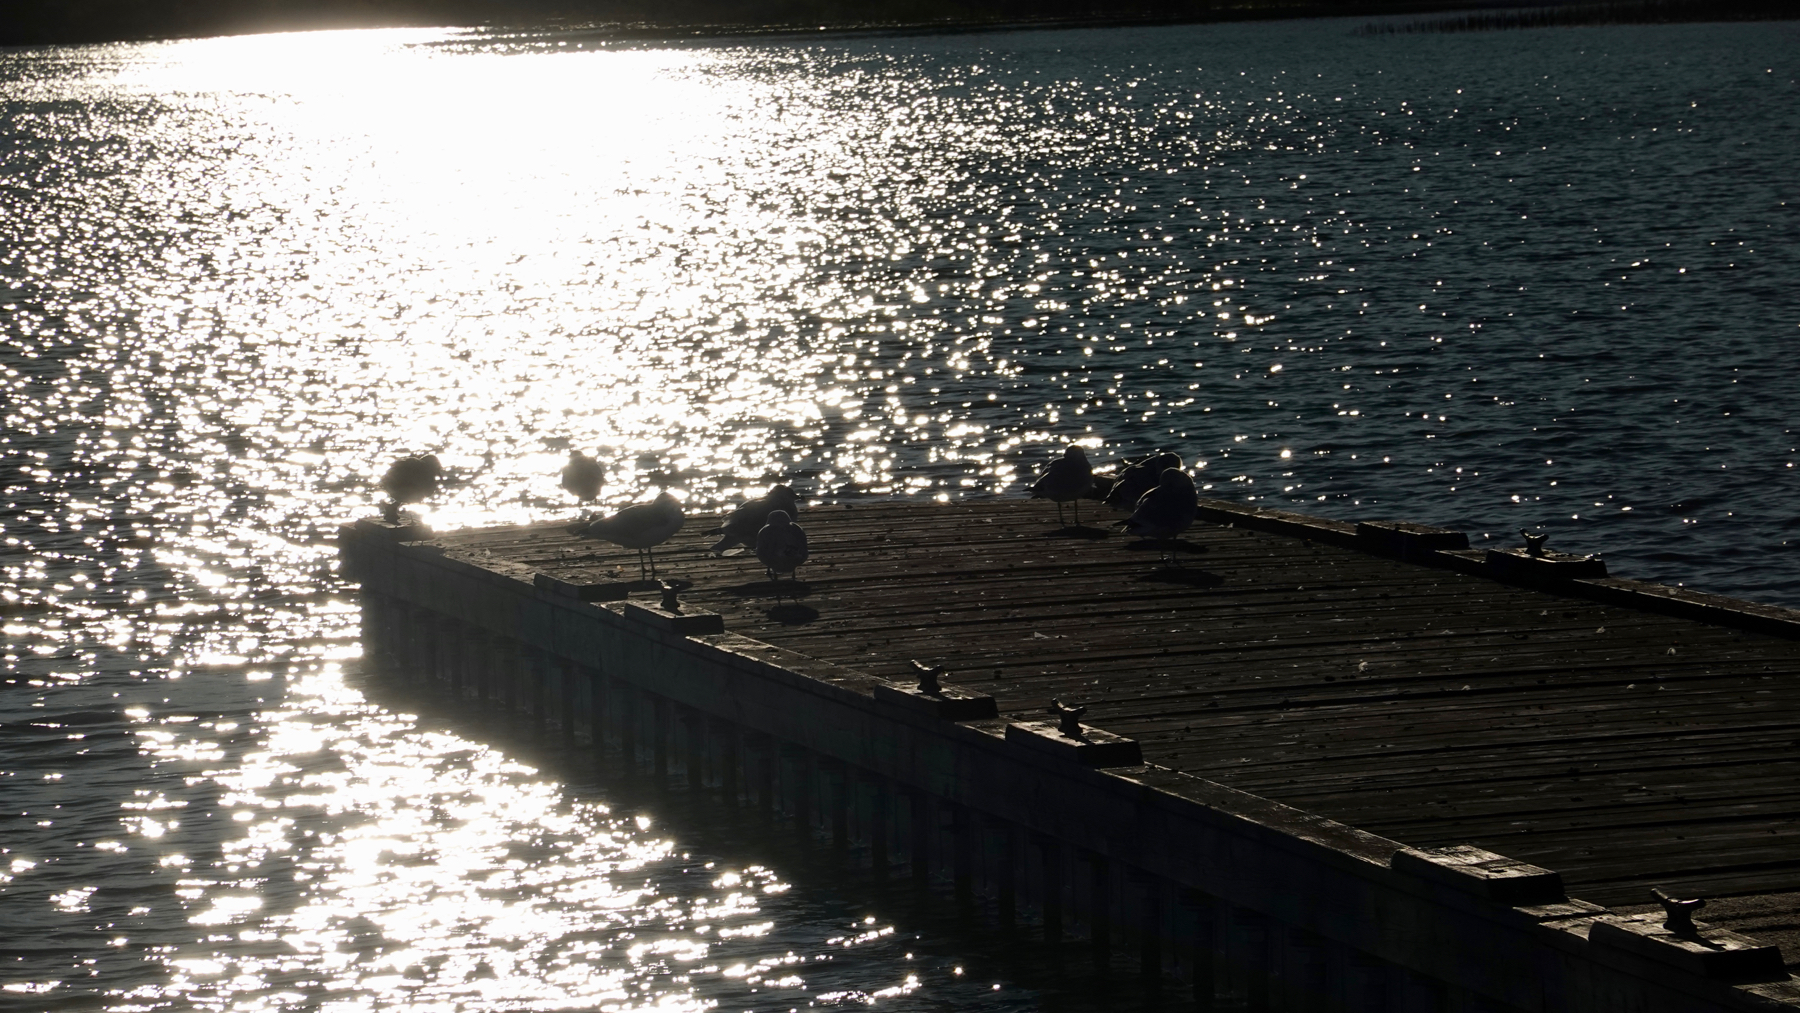 Marina gulls